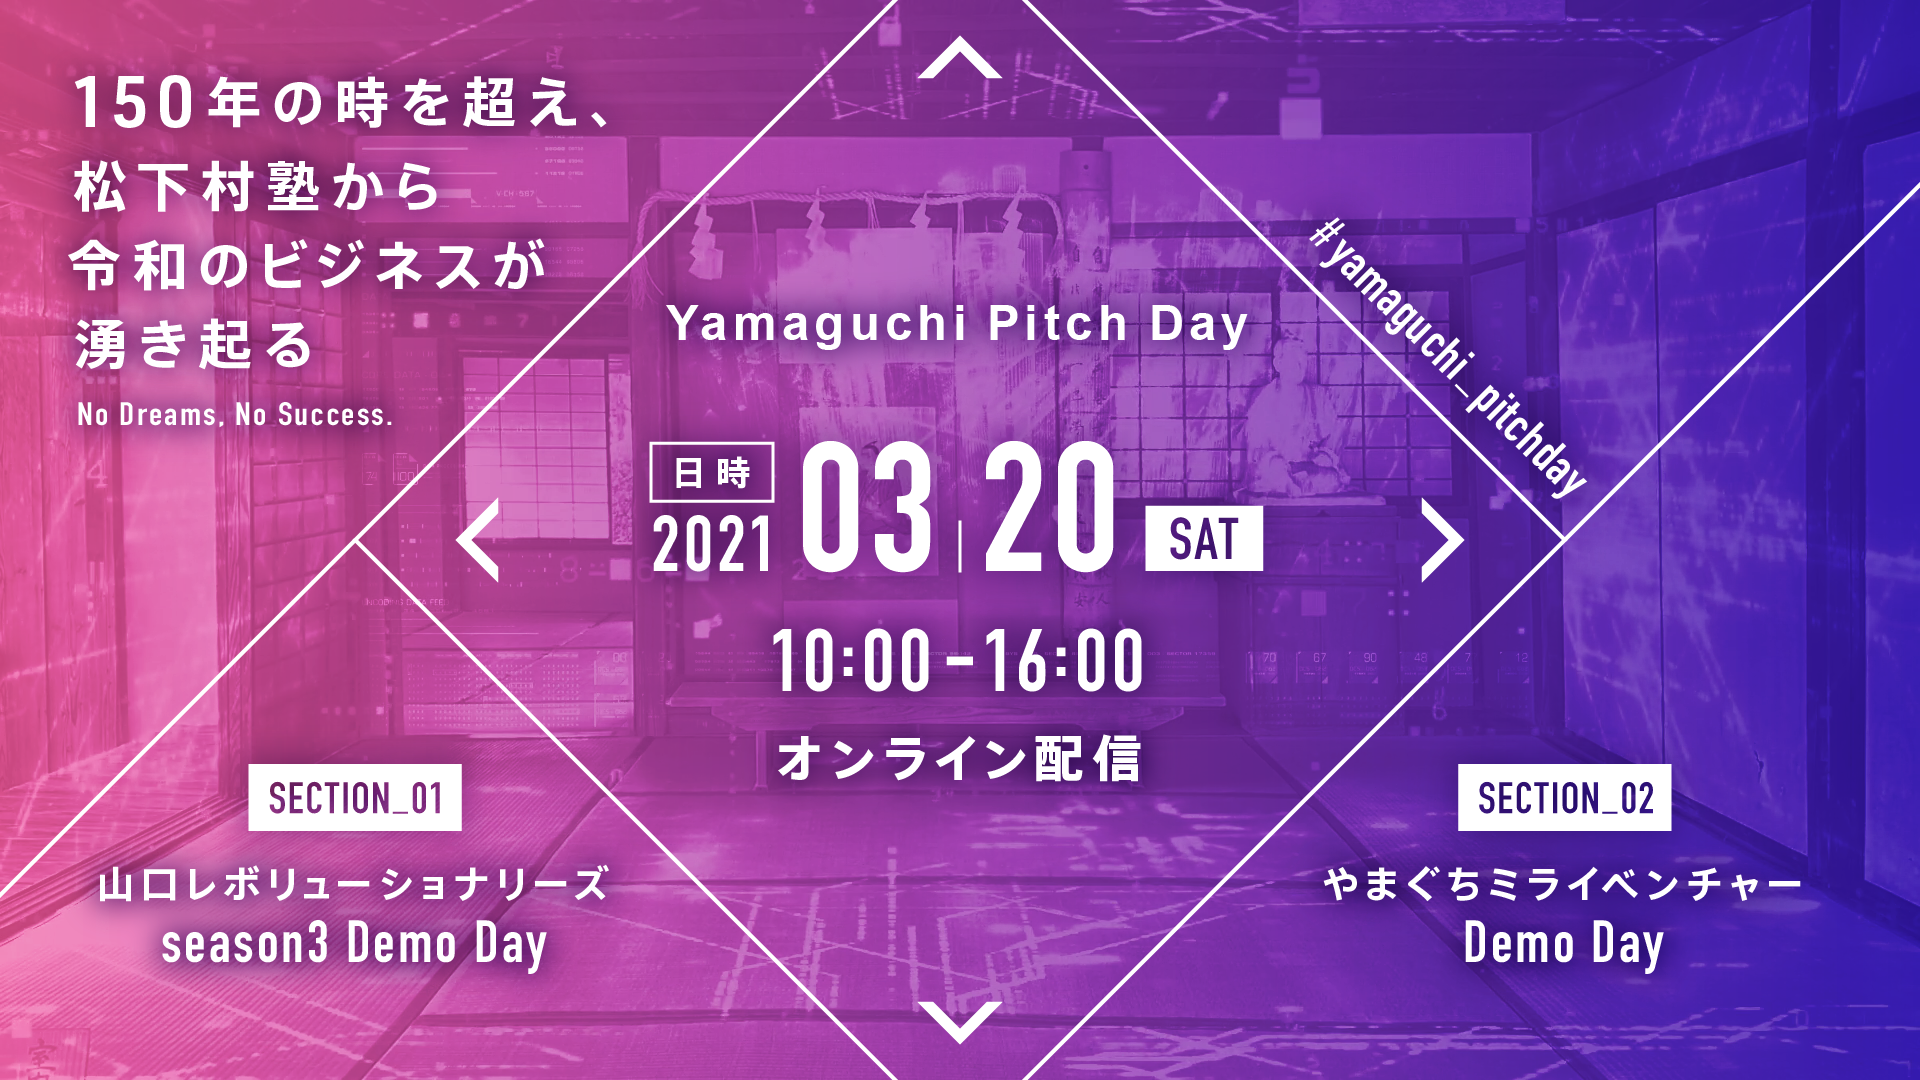 「Yamaguchi Pitch Day in松下村塾」の開催について